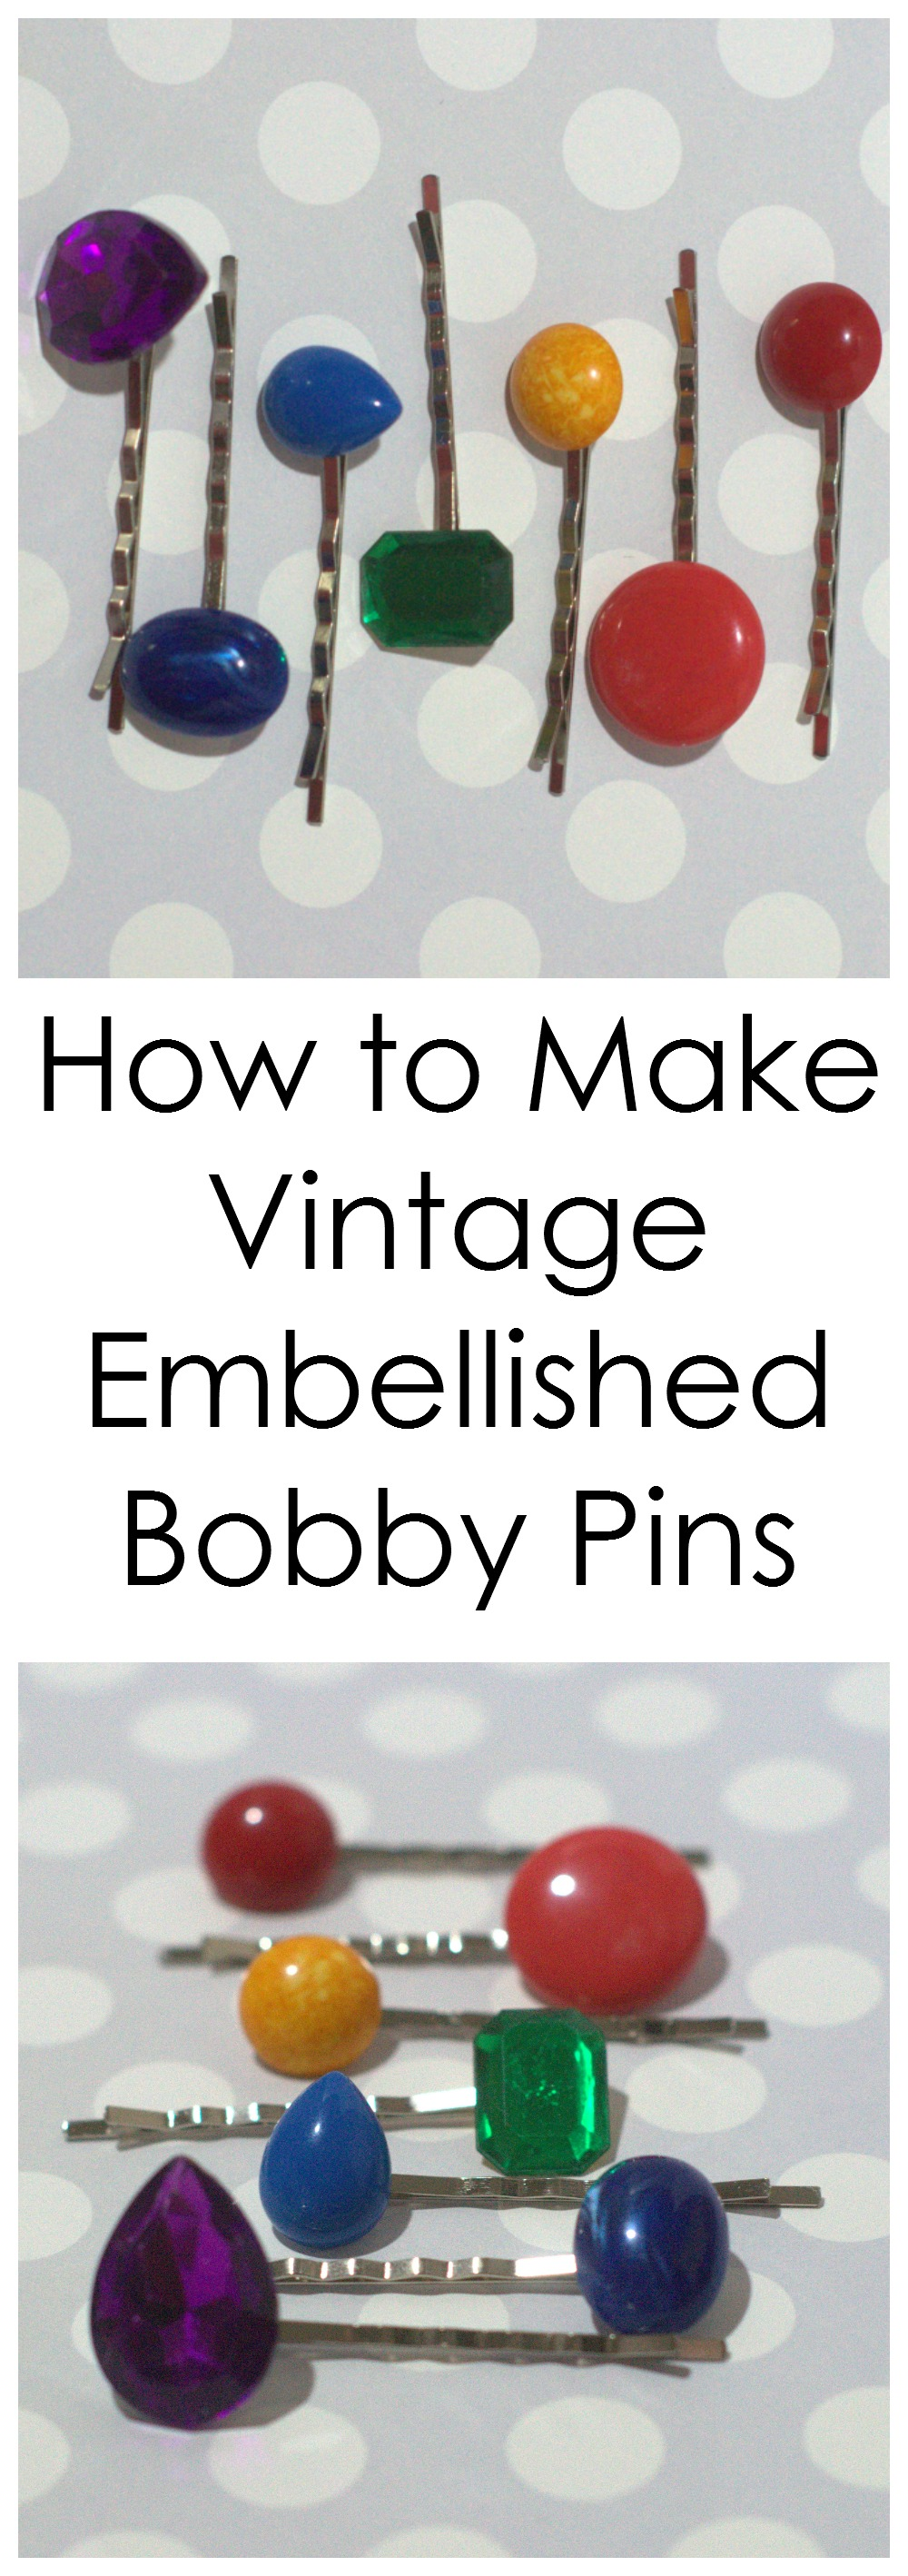 How to make vintage embellished bobby pins